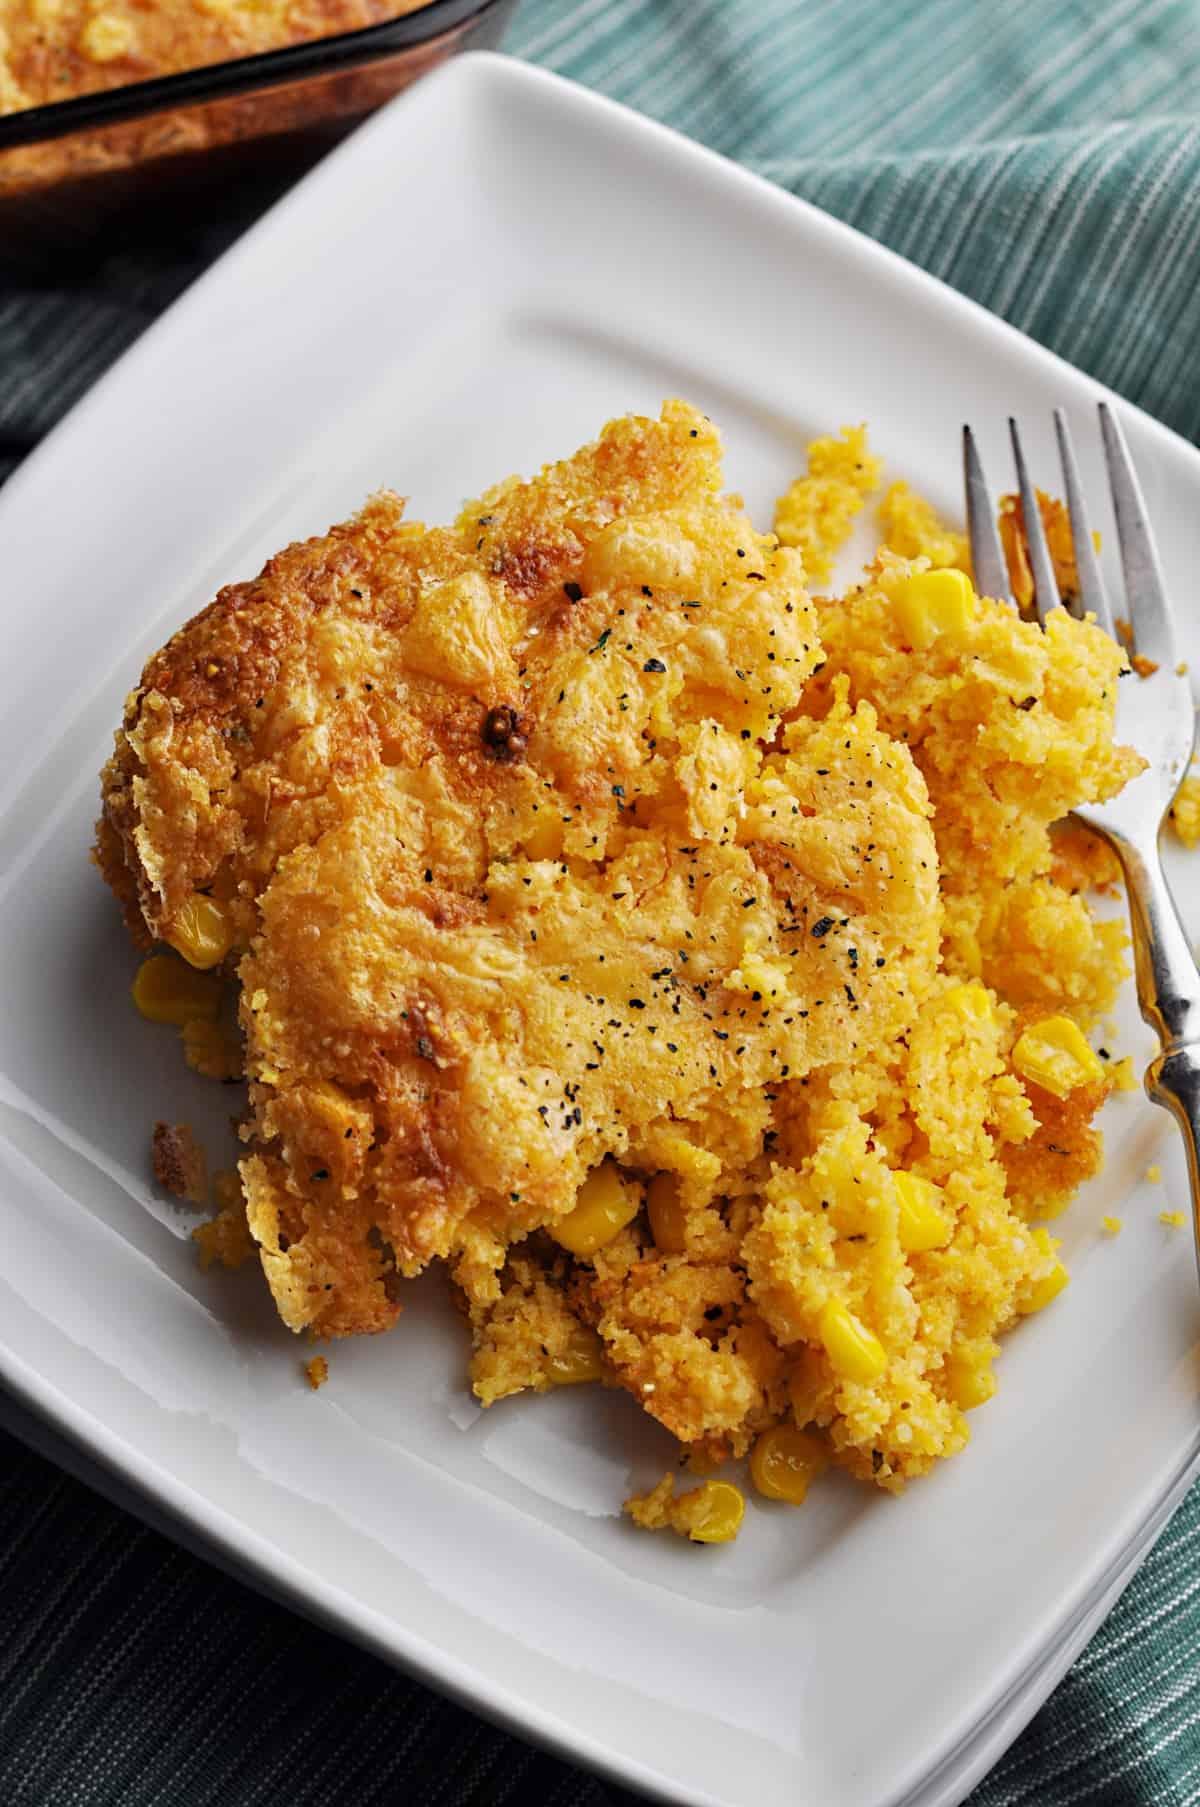 Baked cornbread casserole on plate